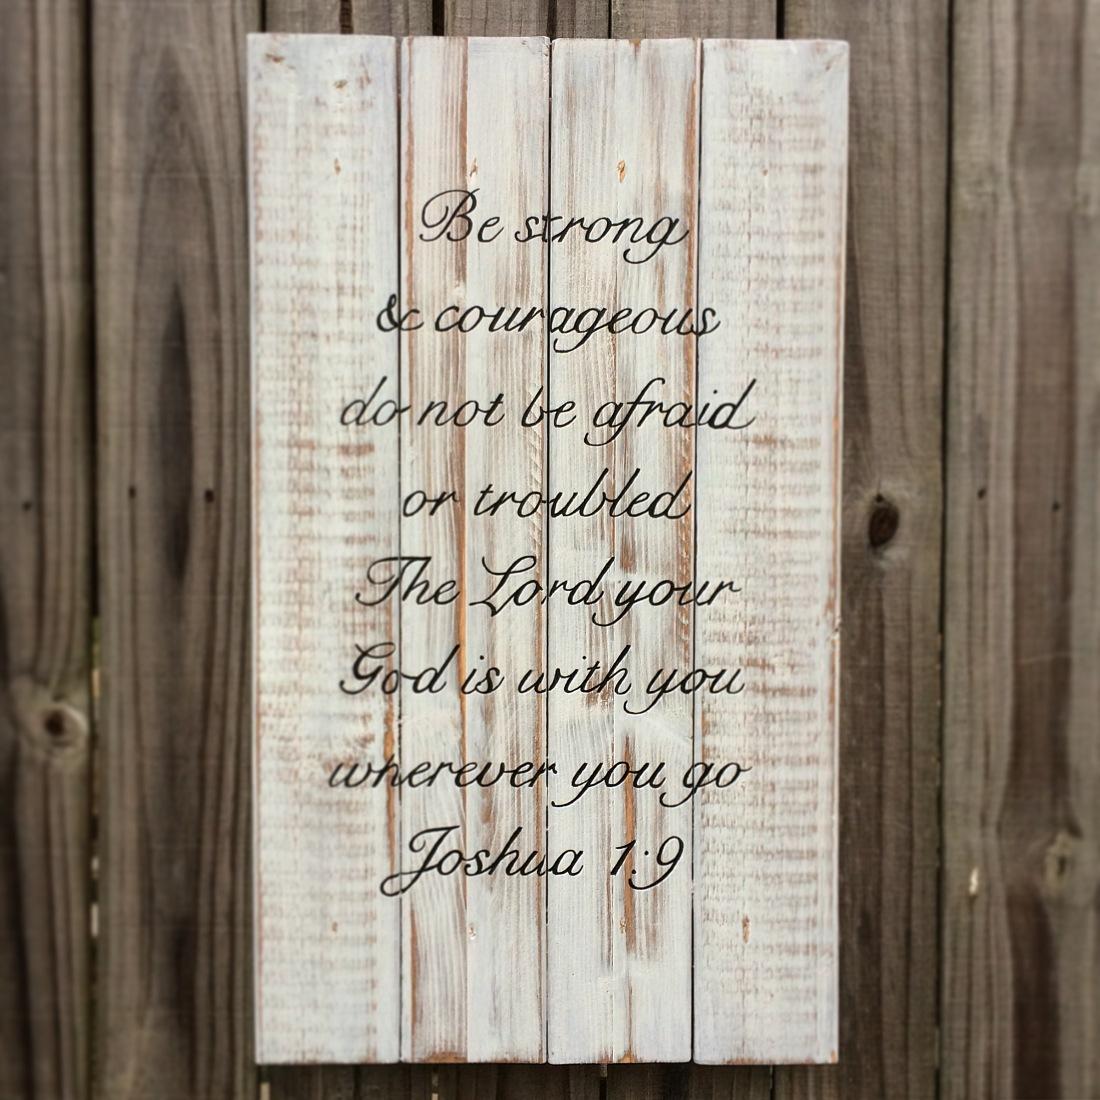 John 1:9 white